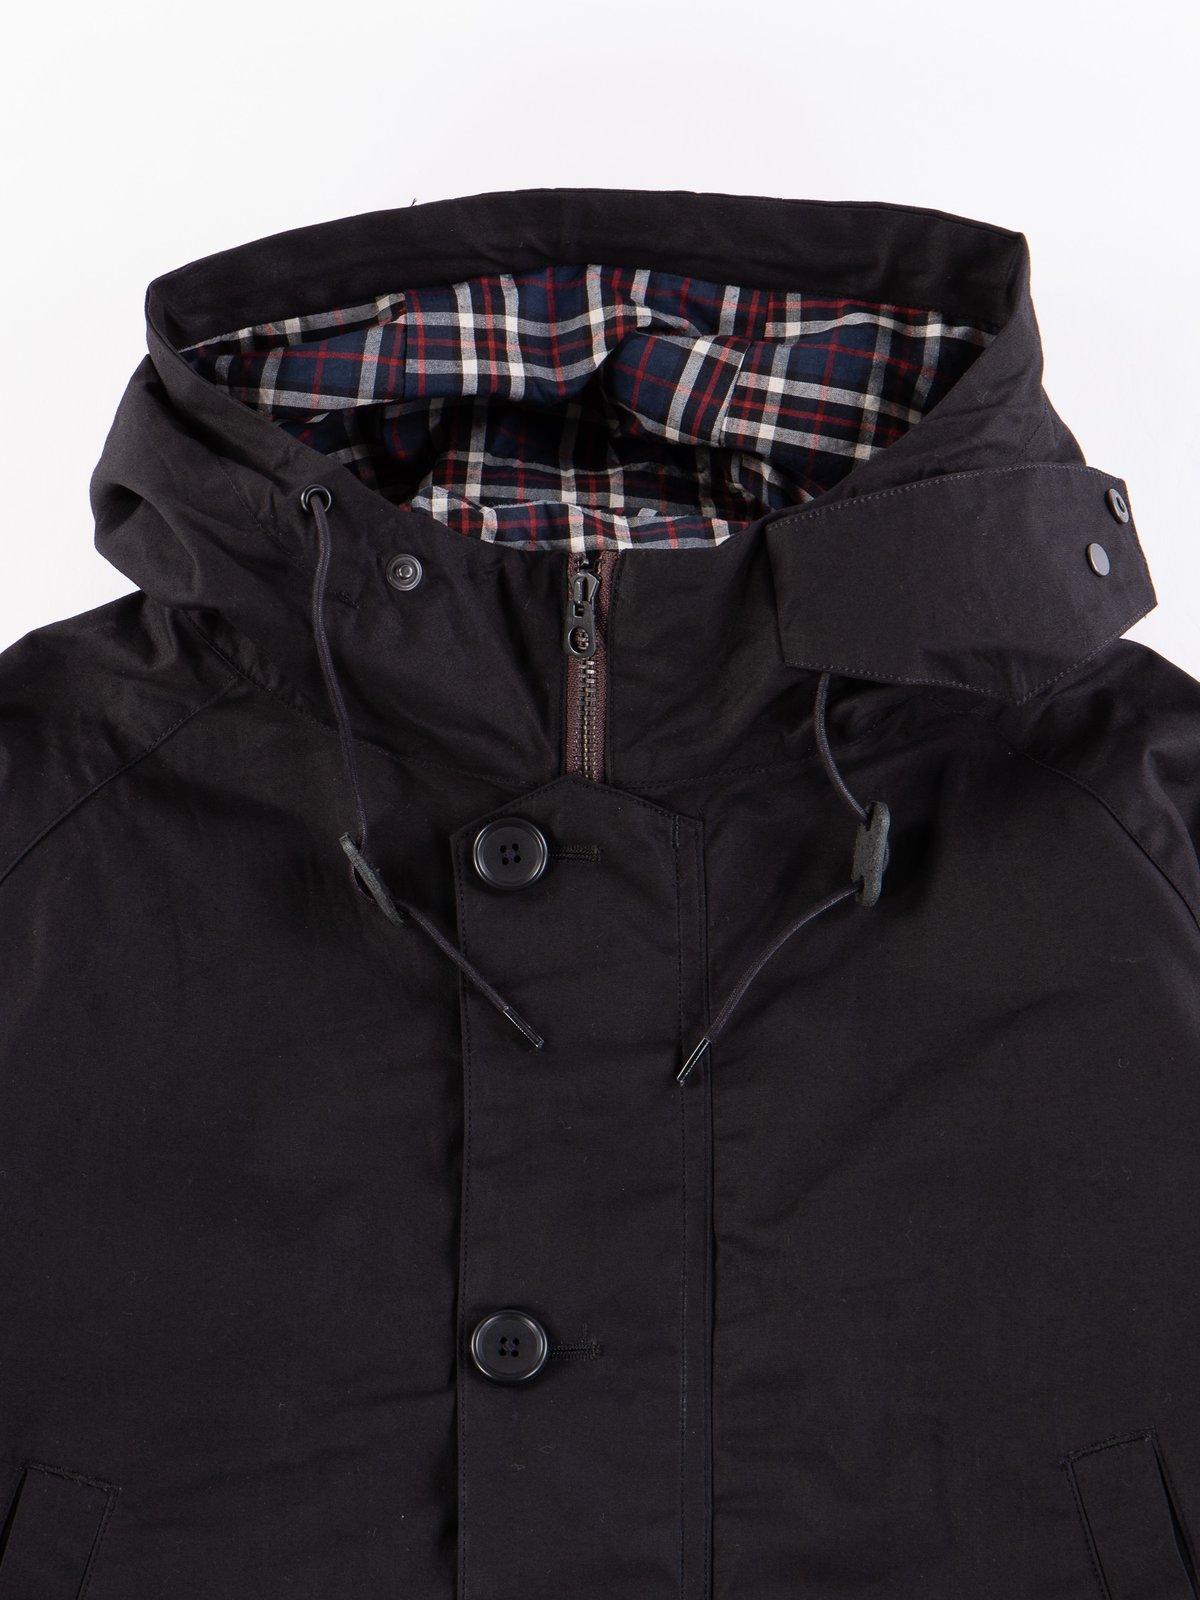 Black British Field Hooded Jacket - Image 2